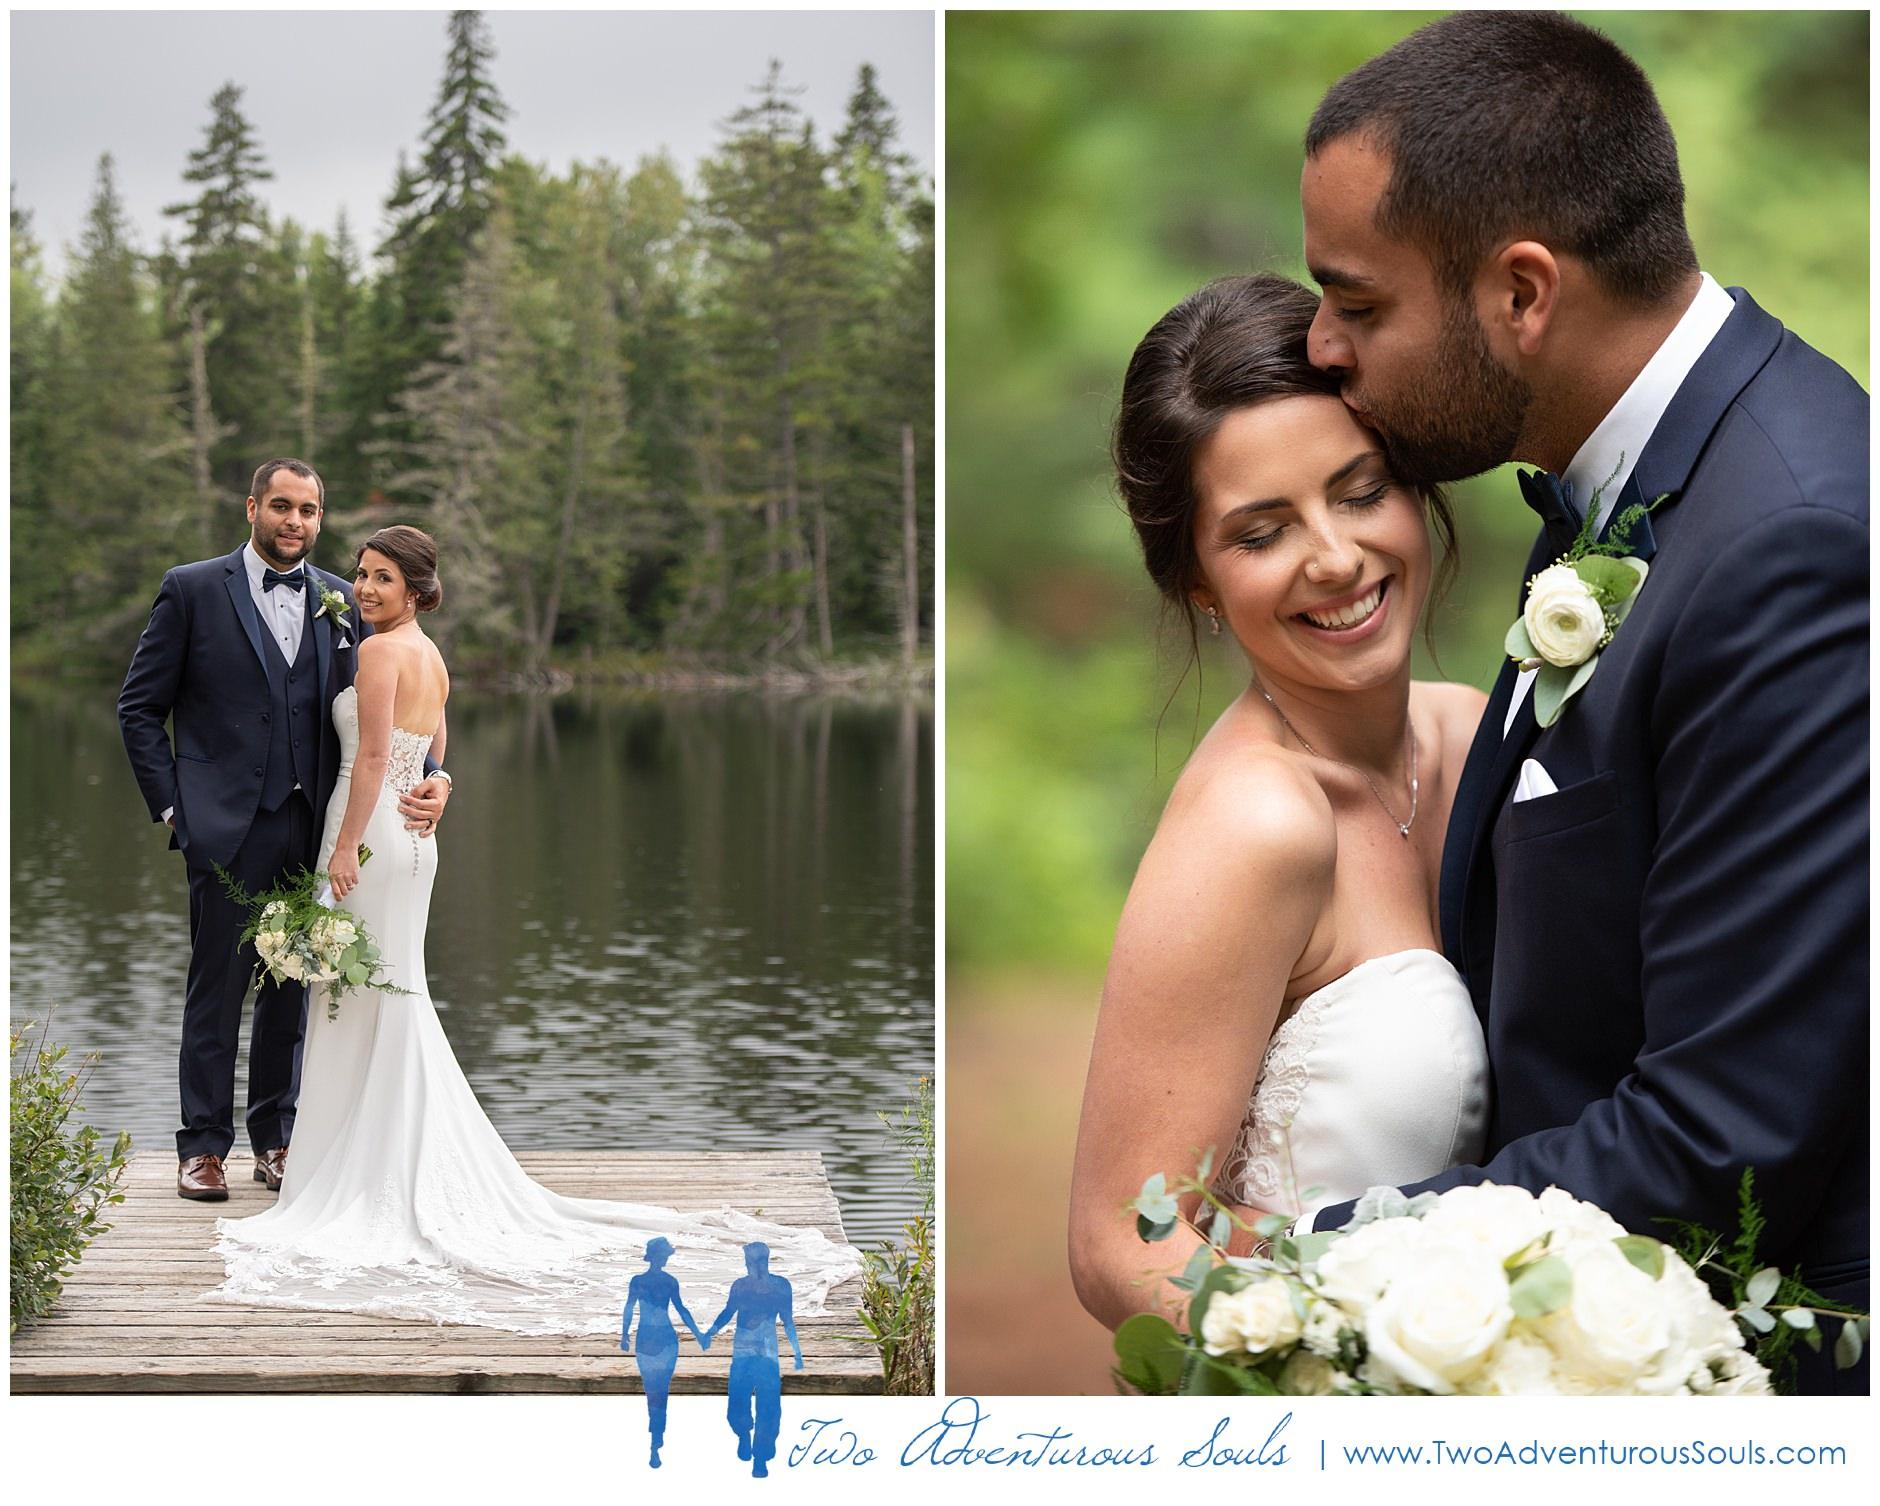 Sugarloaf Outdoor Center Wedding Photographers, Destination Wedding Photographers, Two Adventurous Souls-081719_0049.jpg